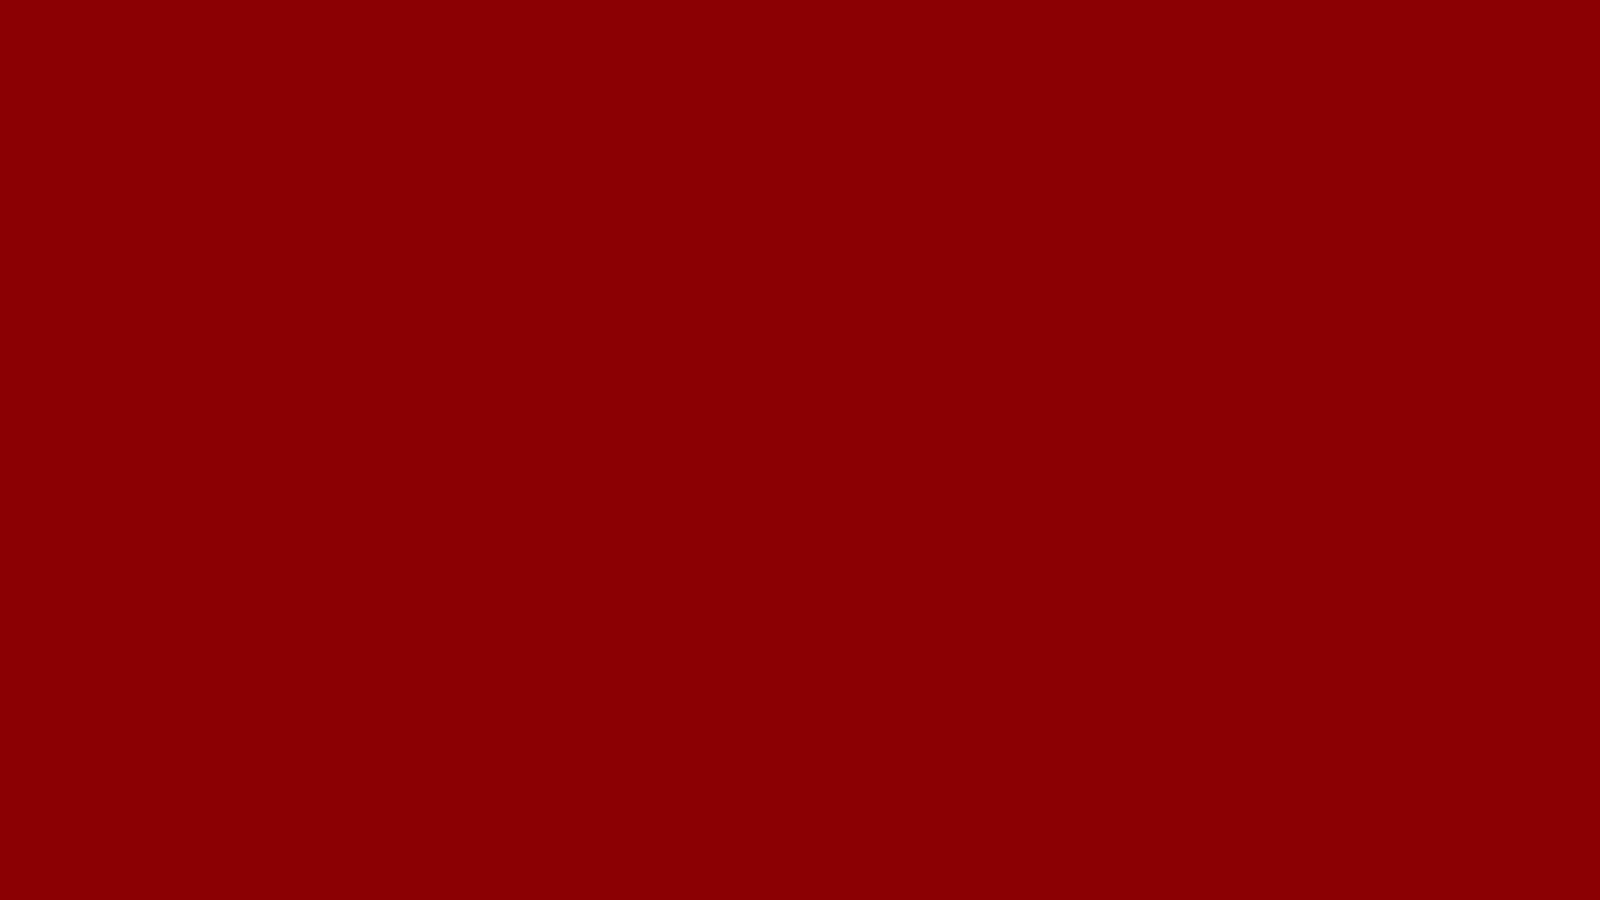 Dark Red Colour Wallpaper Desain Red Background ...